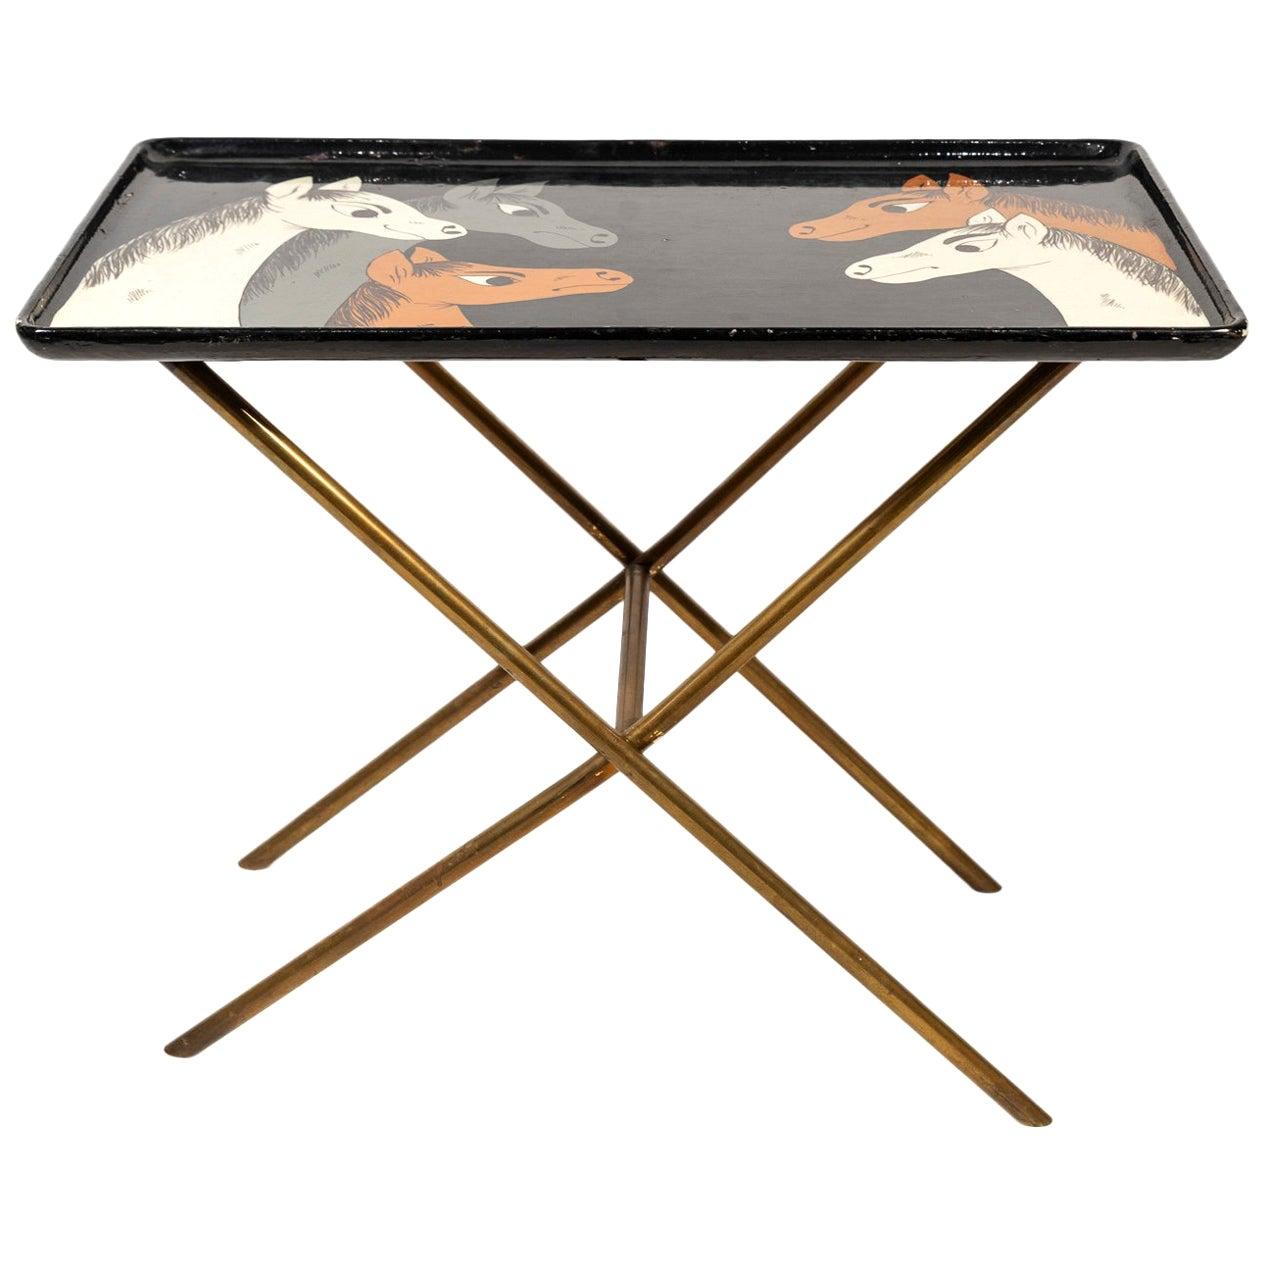 Gabriella Crespi, Tray Table, Signed, circa 1970